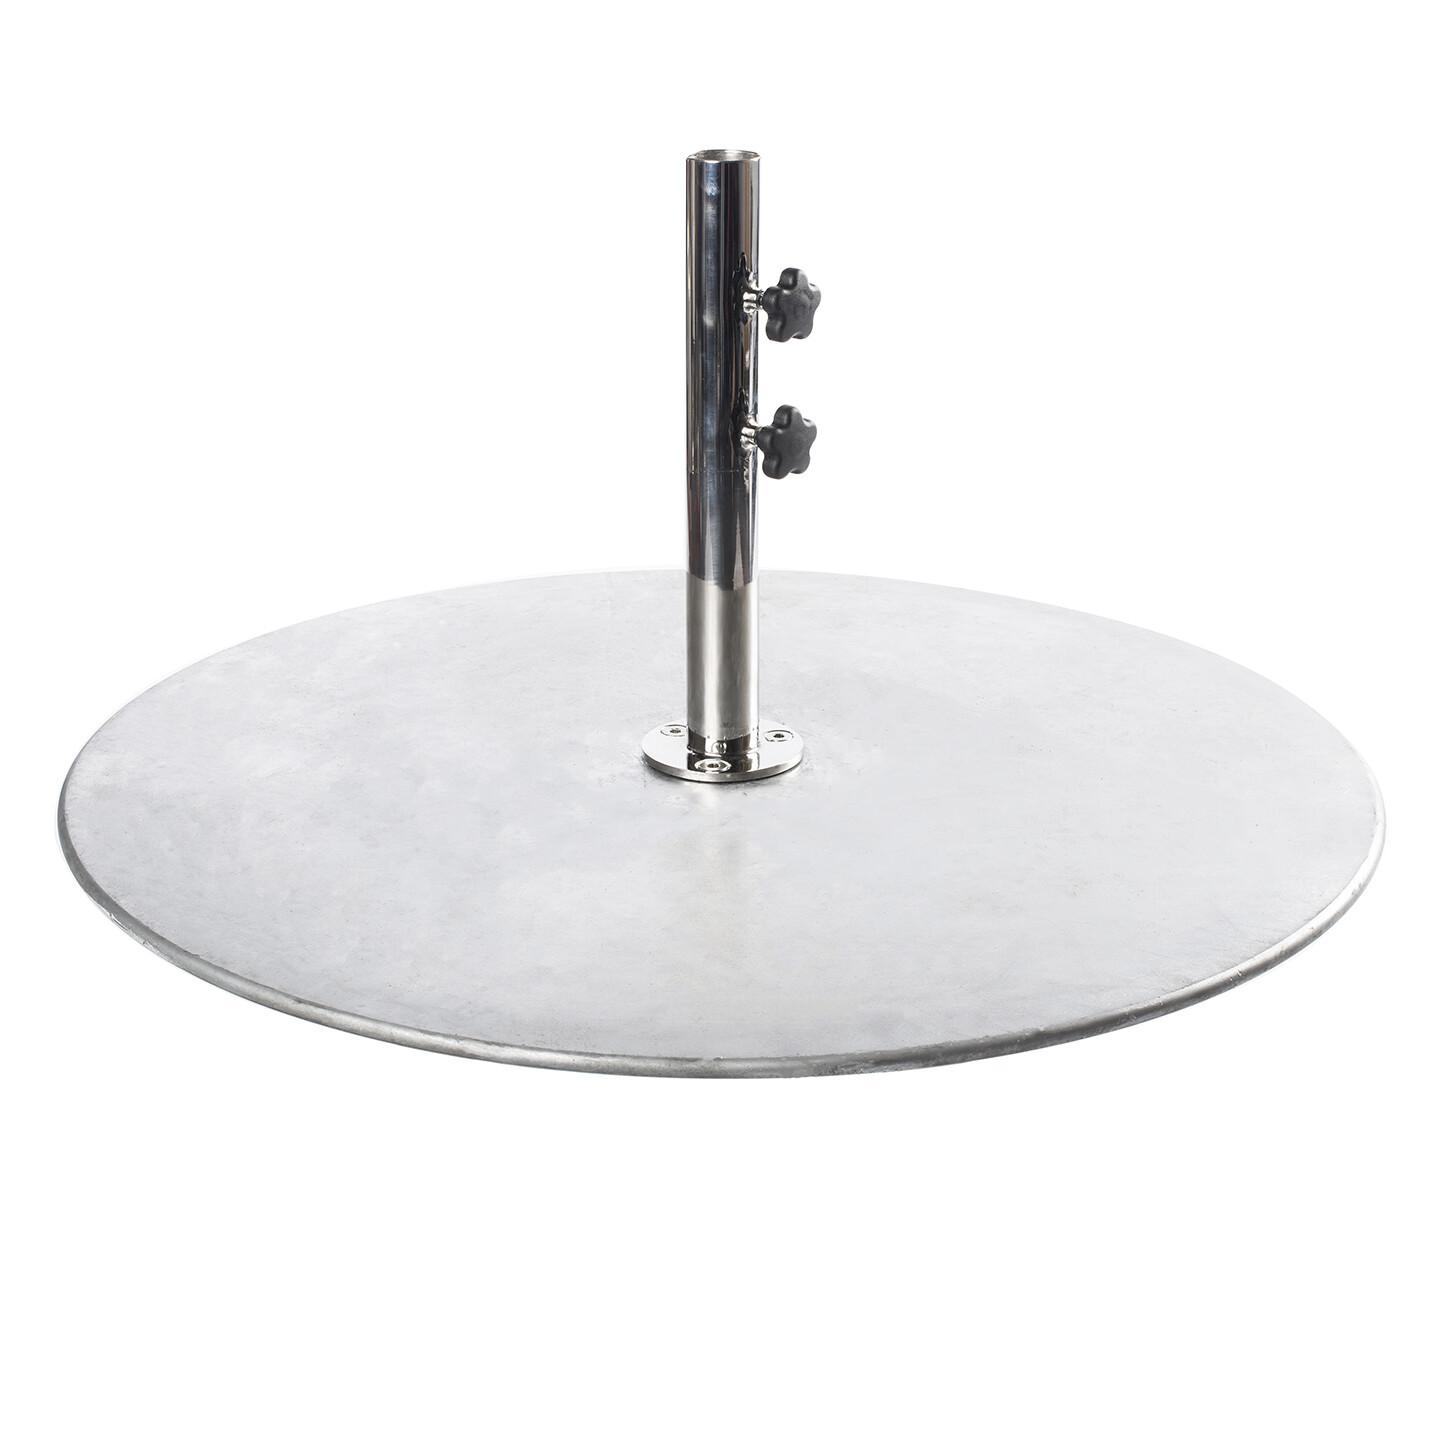 Galvanized Steel Plate Round Base | 185 LBS